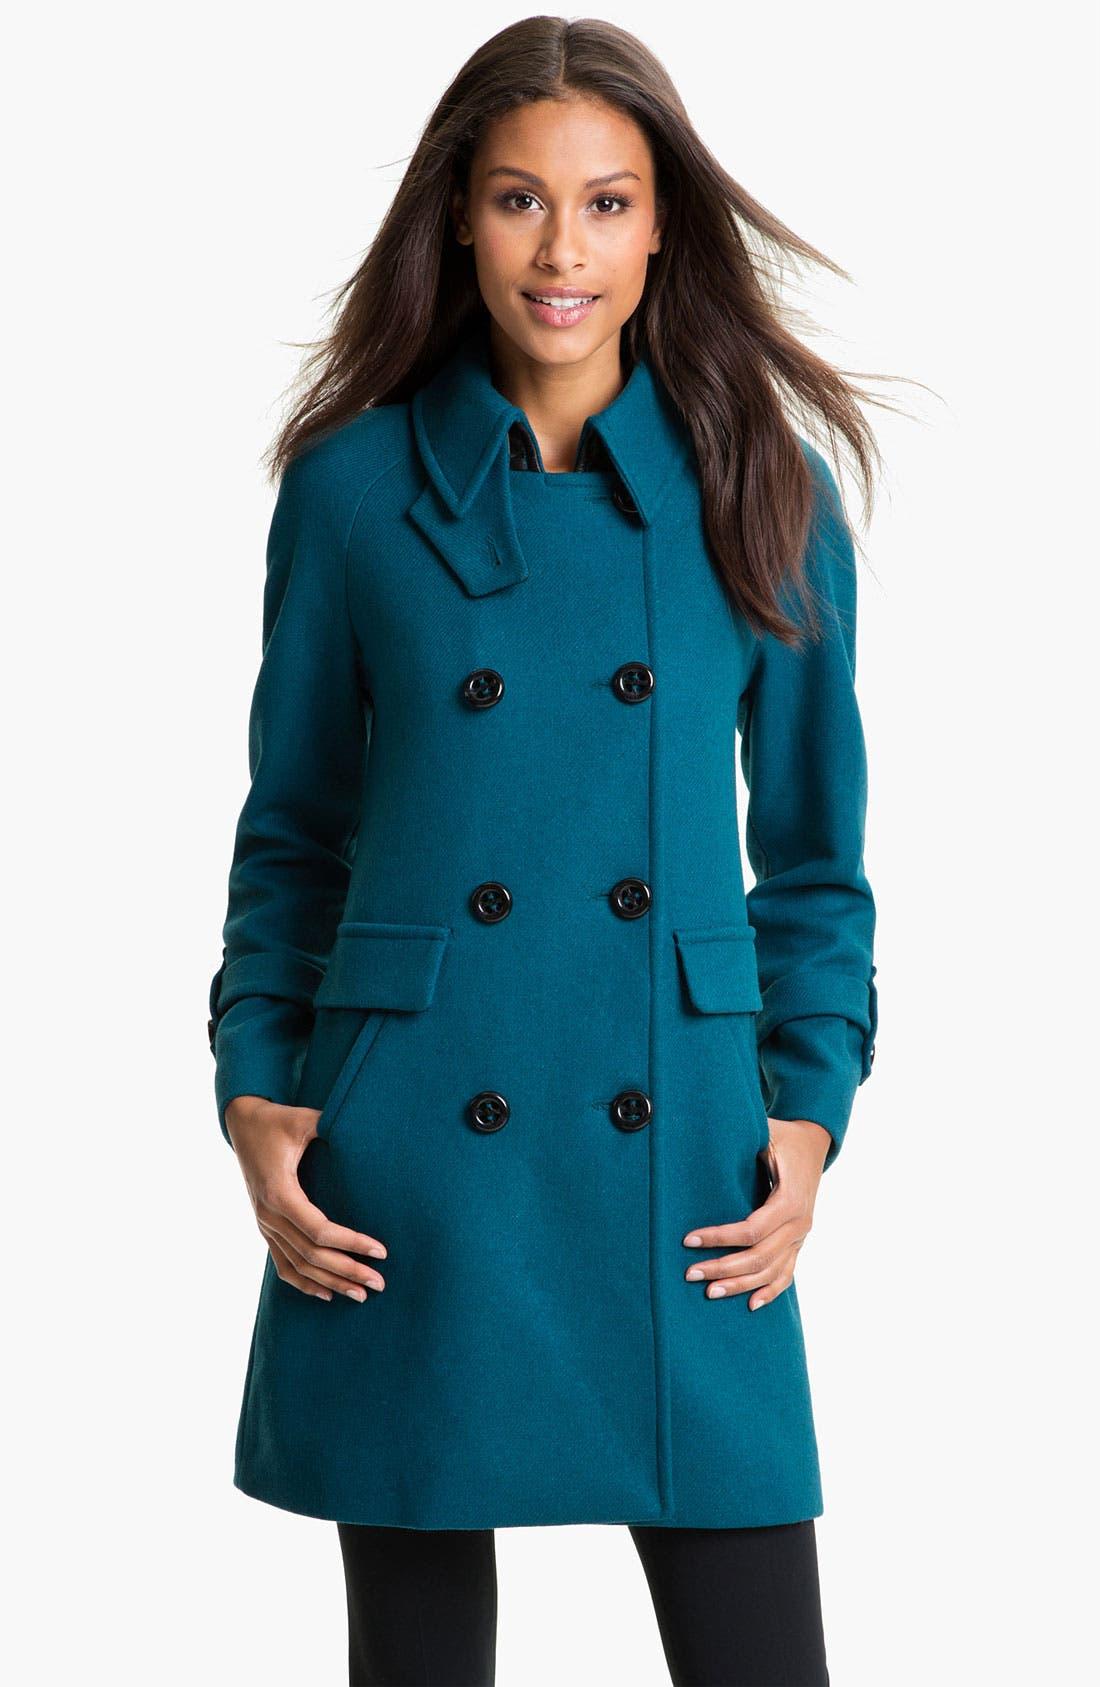 Main Image - Trina Turk Double Breasted Coat